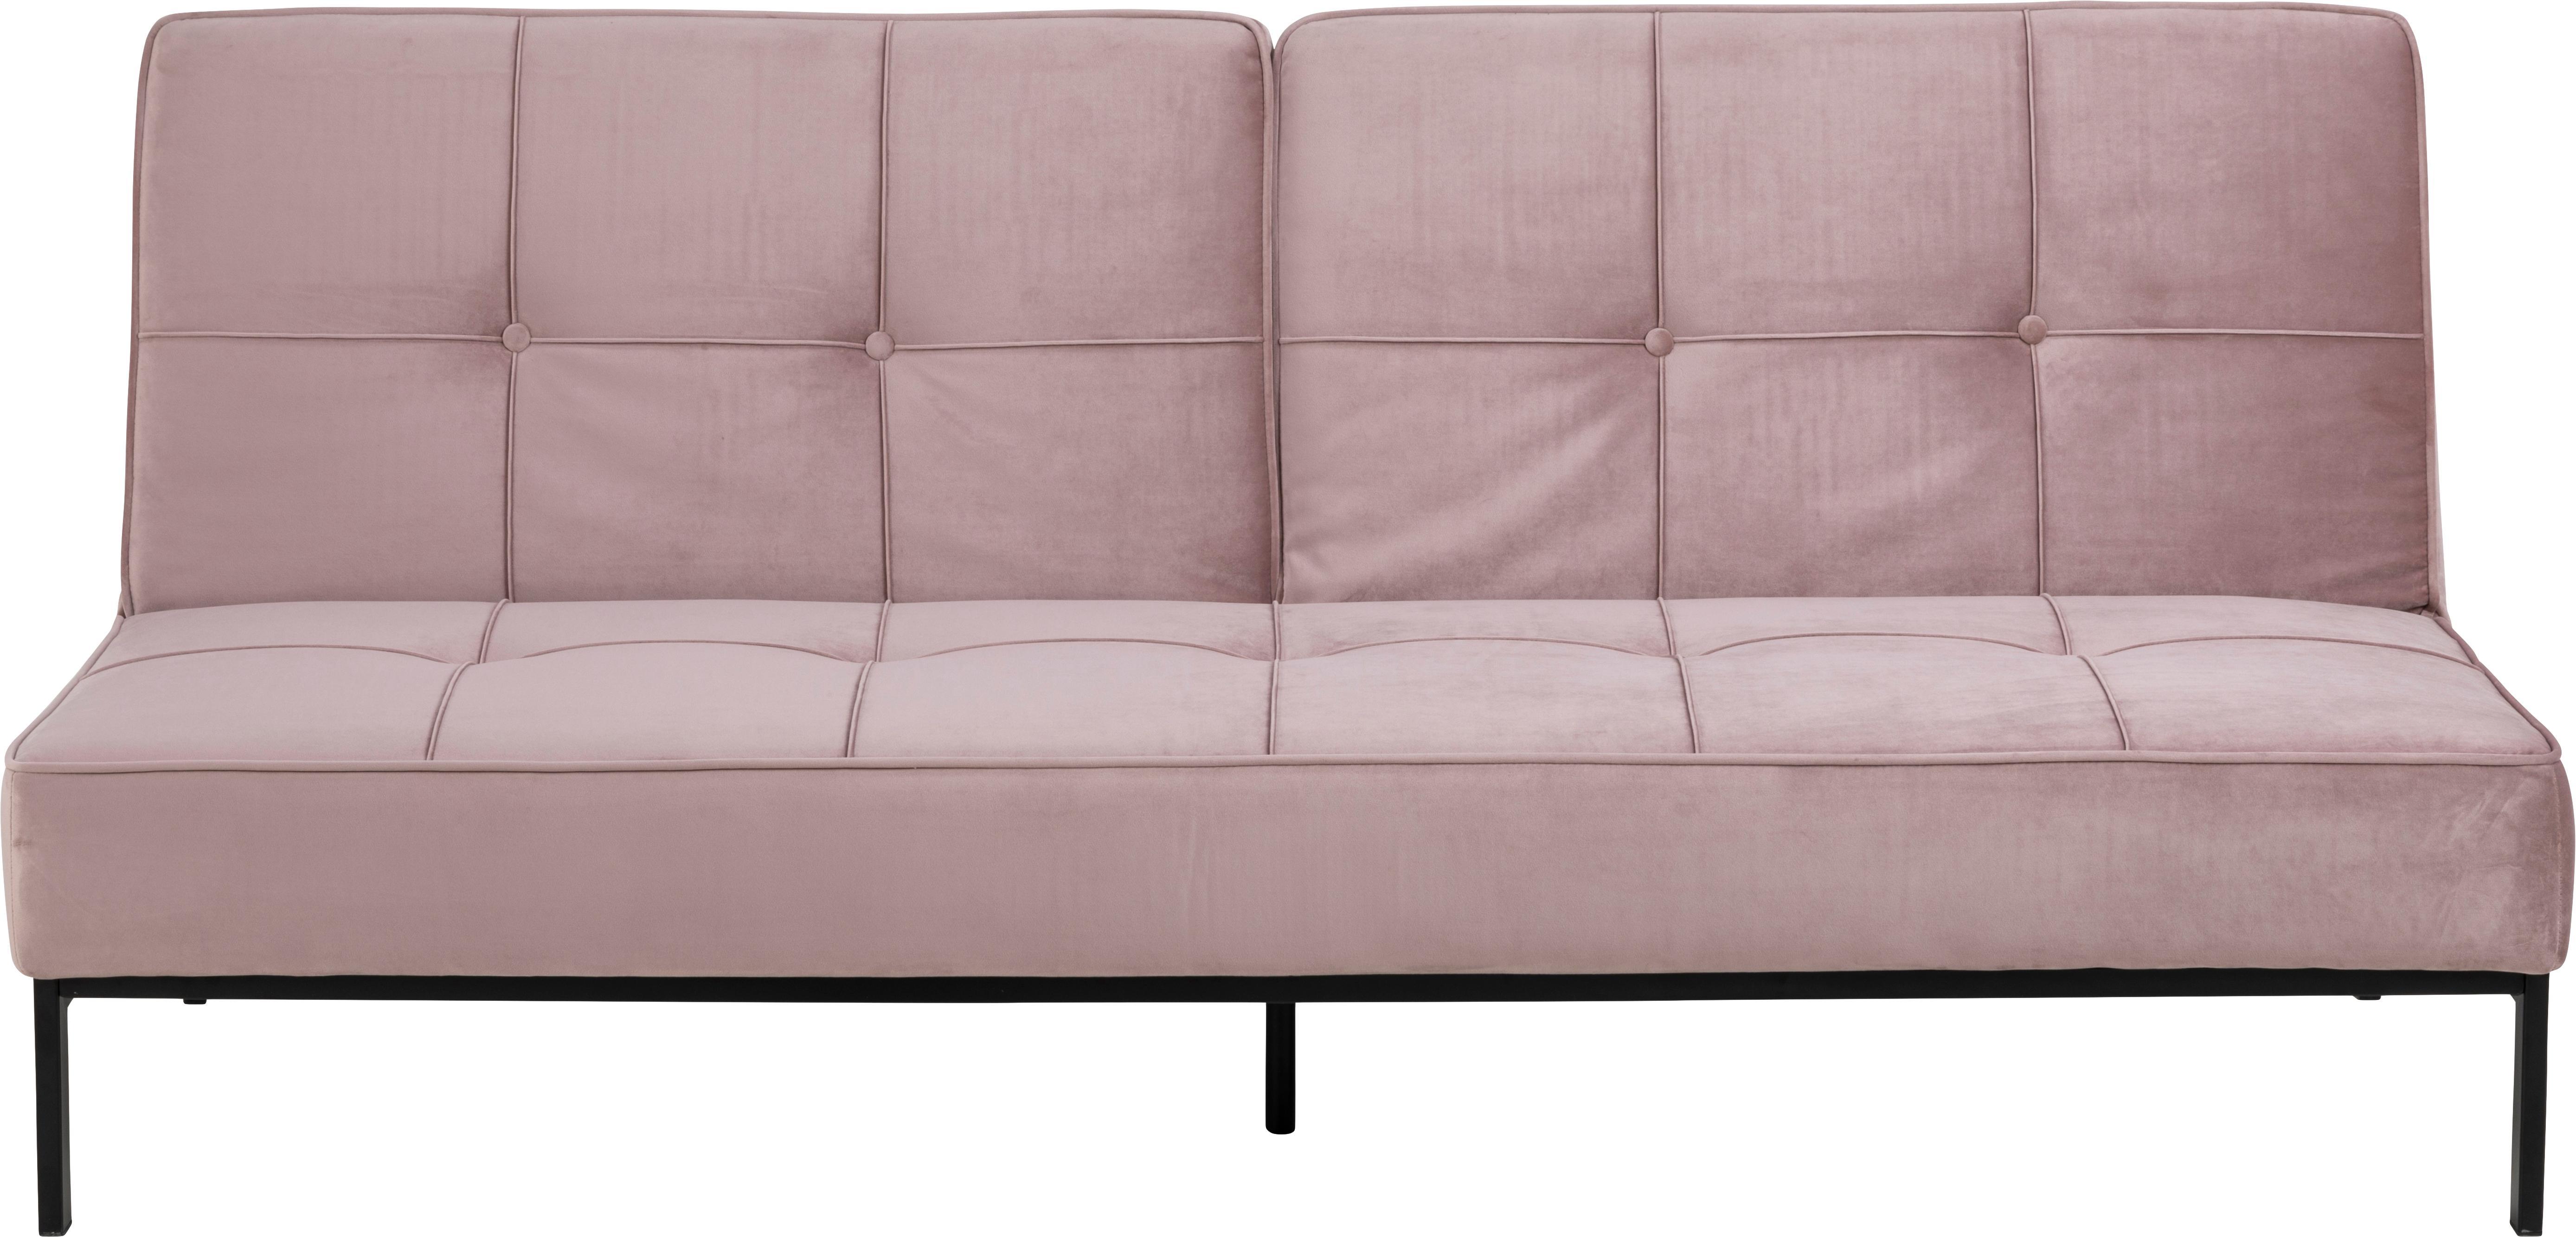 Fluwelen slaapbank Perugia, Bekleding: polyester fluweel, Poten: gelakt metaal, Fluweel roze, B 198  x D 95 cm